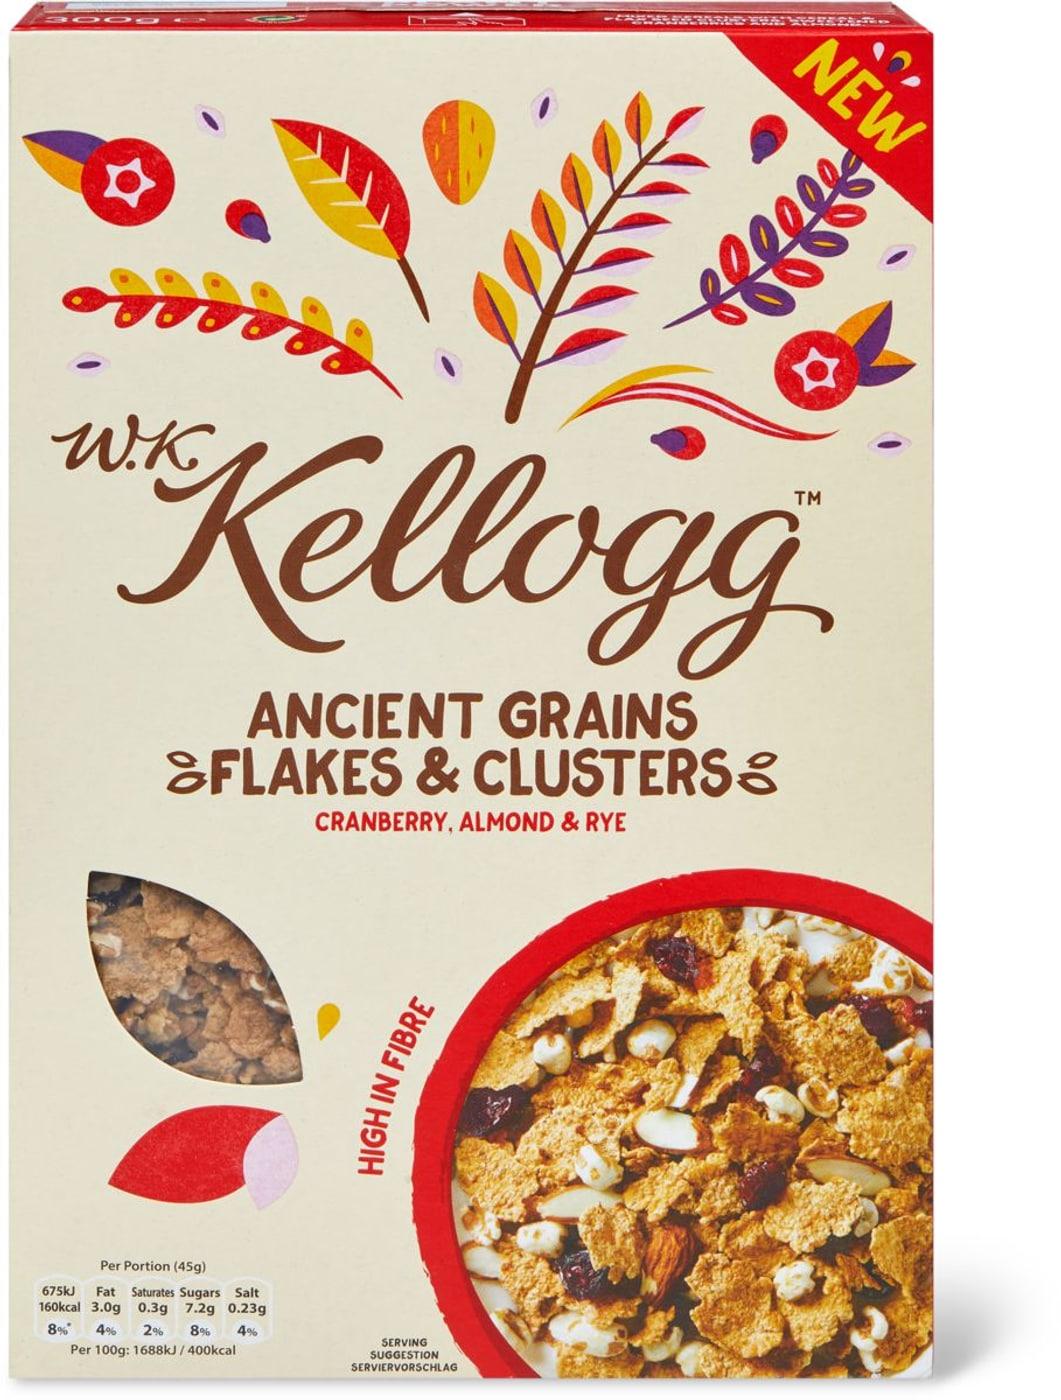 WK Kellogg Grains Flakes Clusters